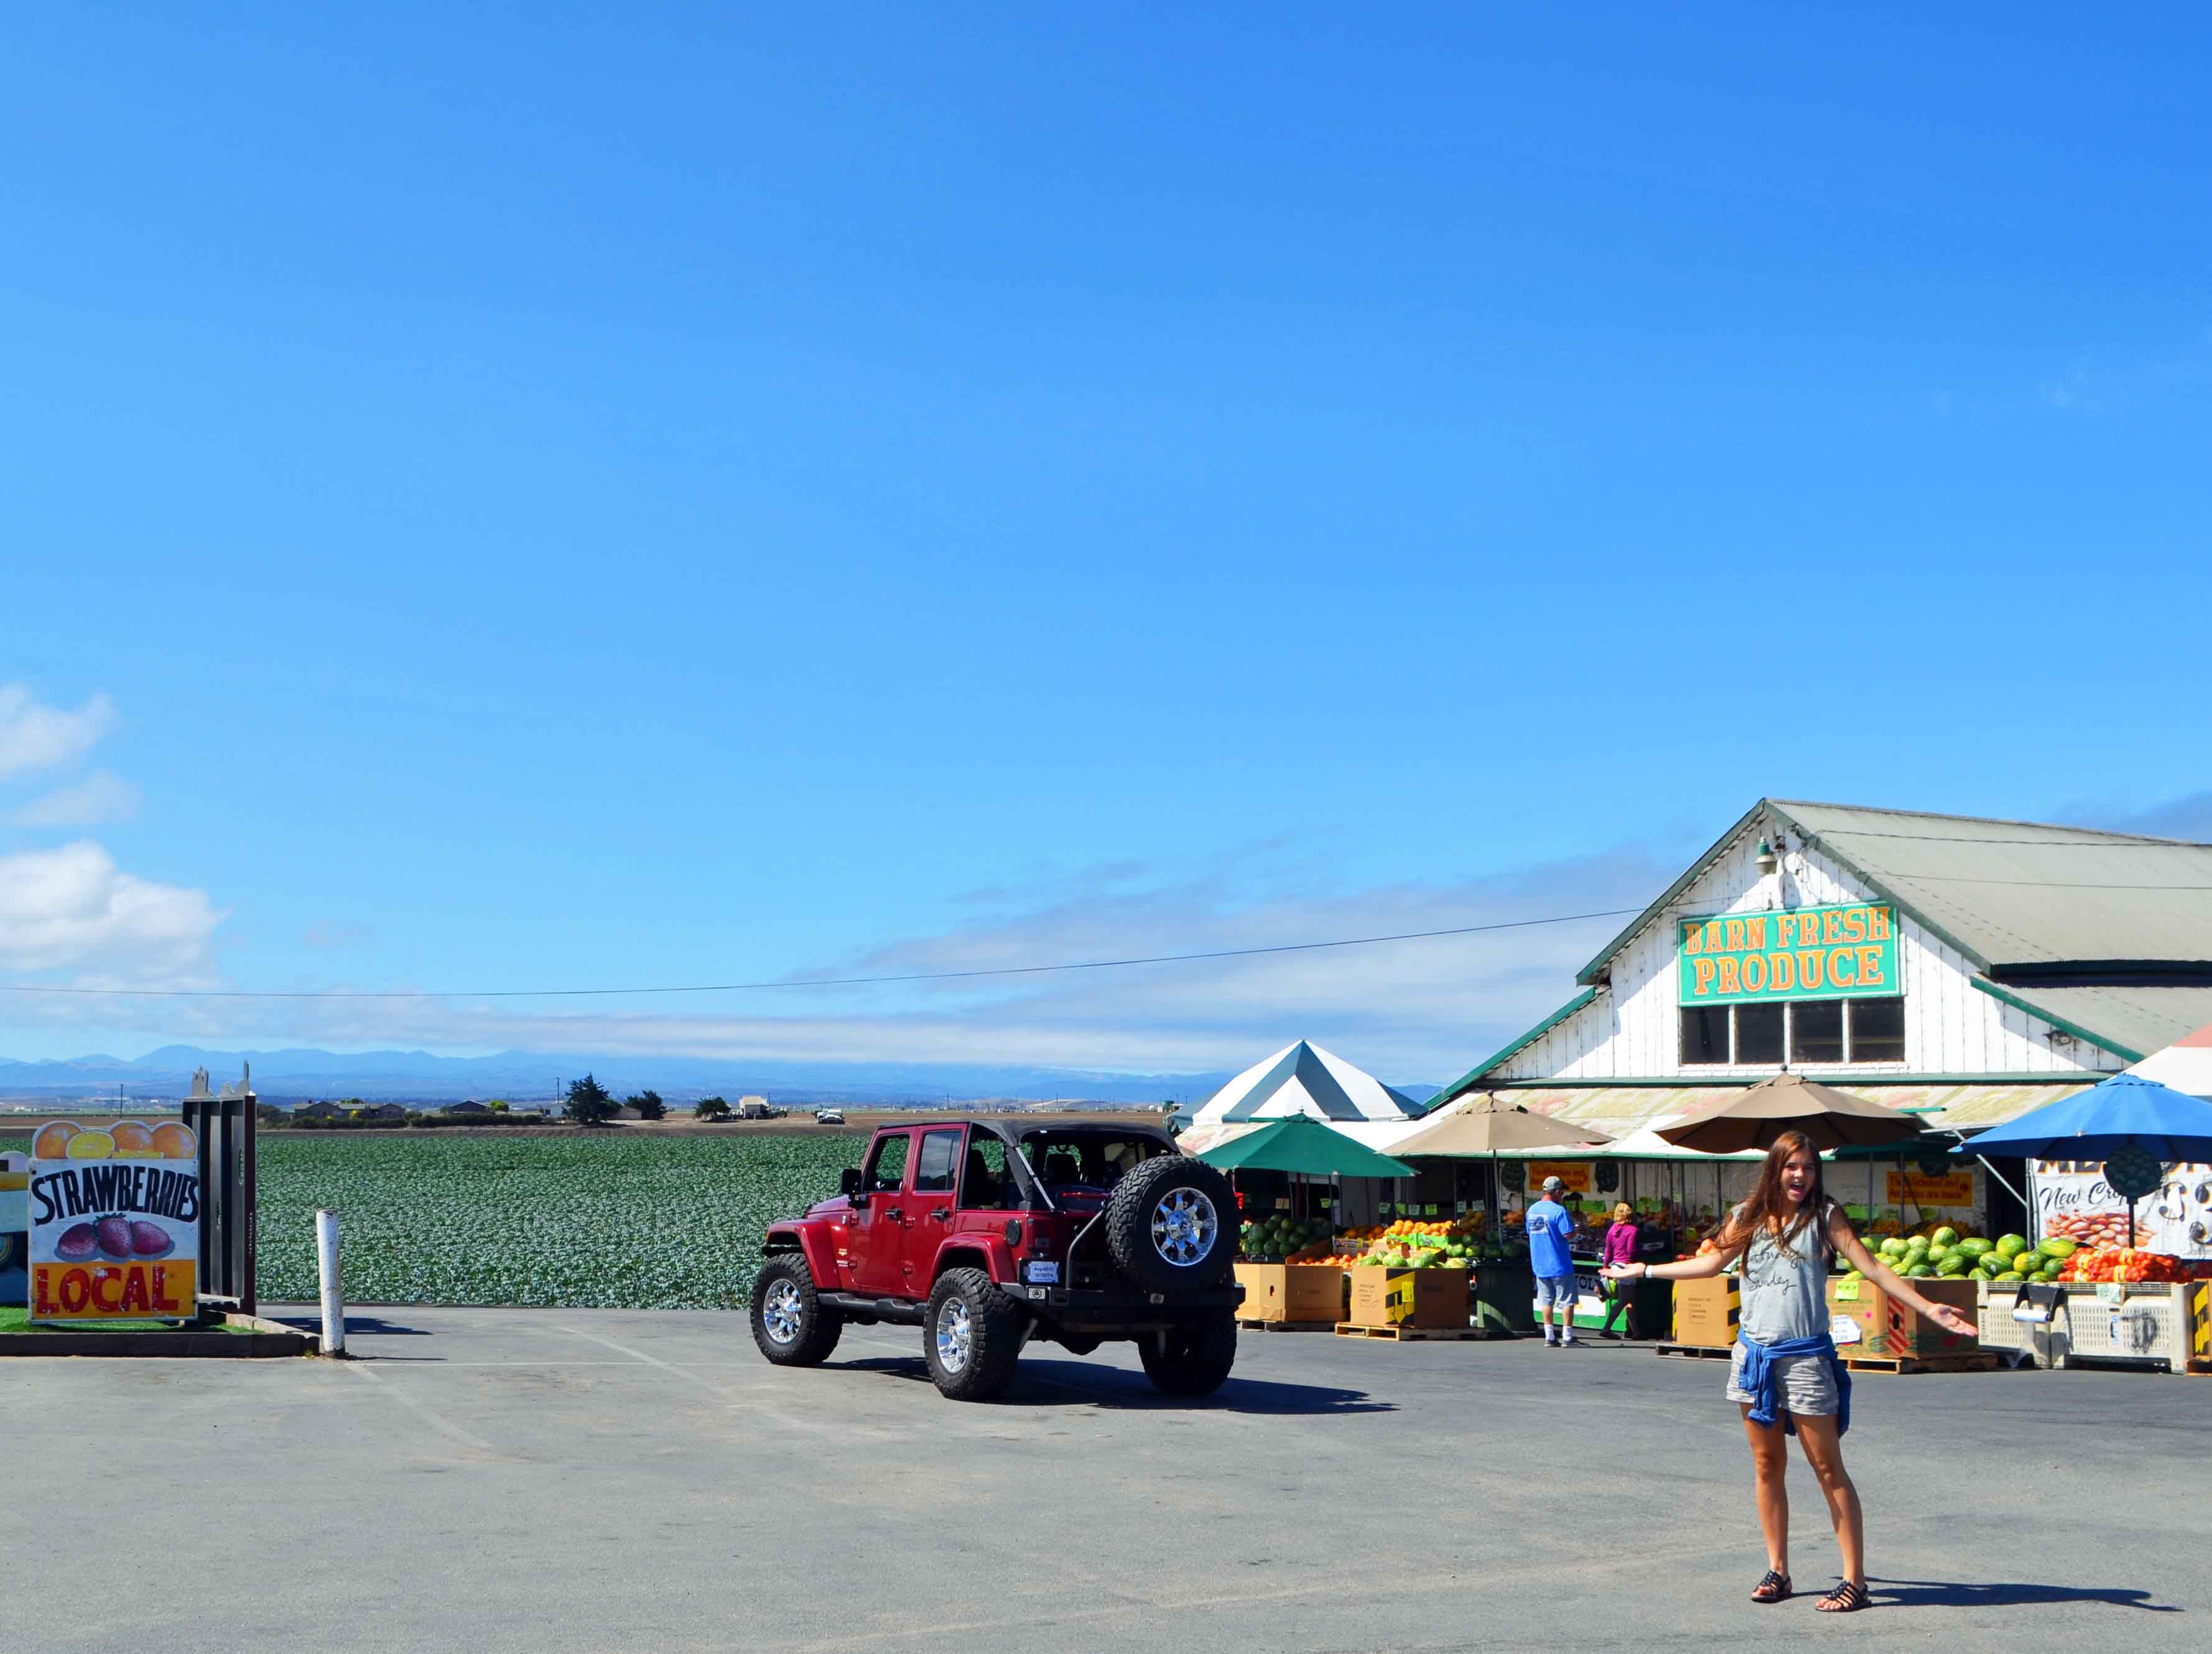 Farmer's Markets California Pacific Coast Highway 1 Road Trip Guide